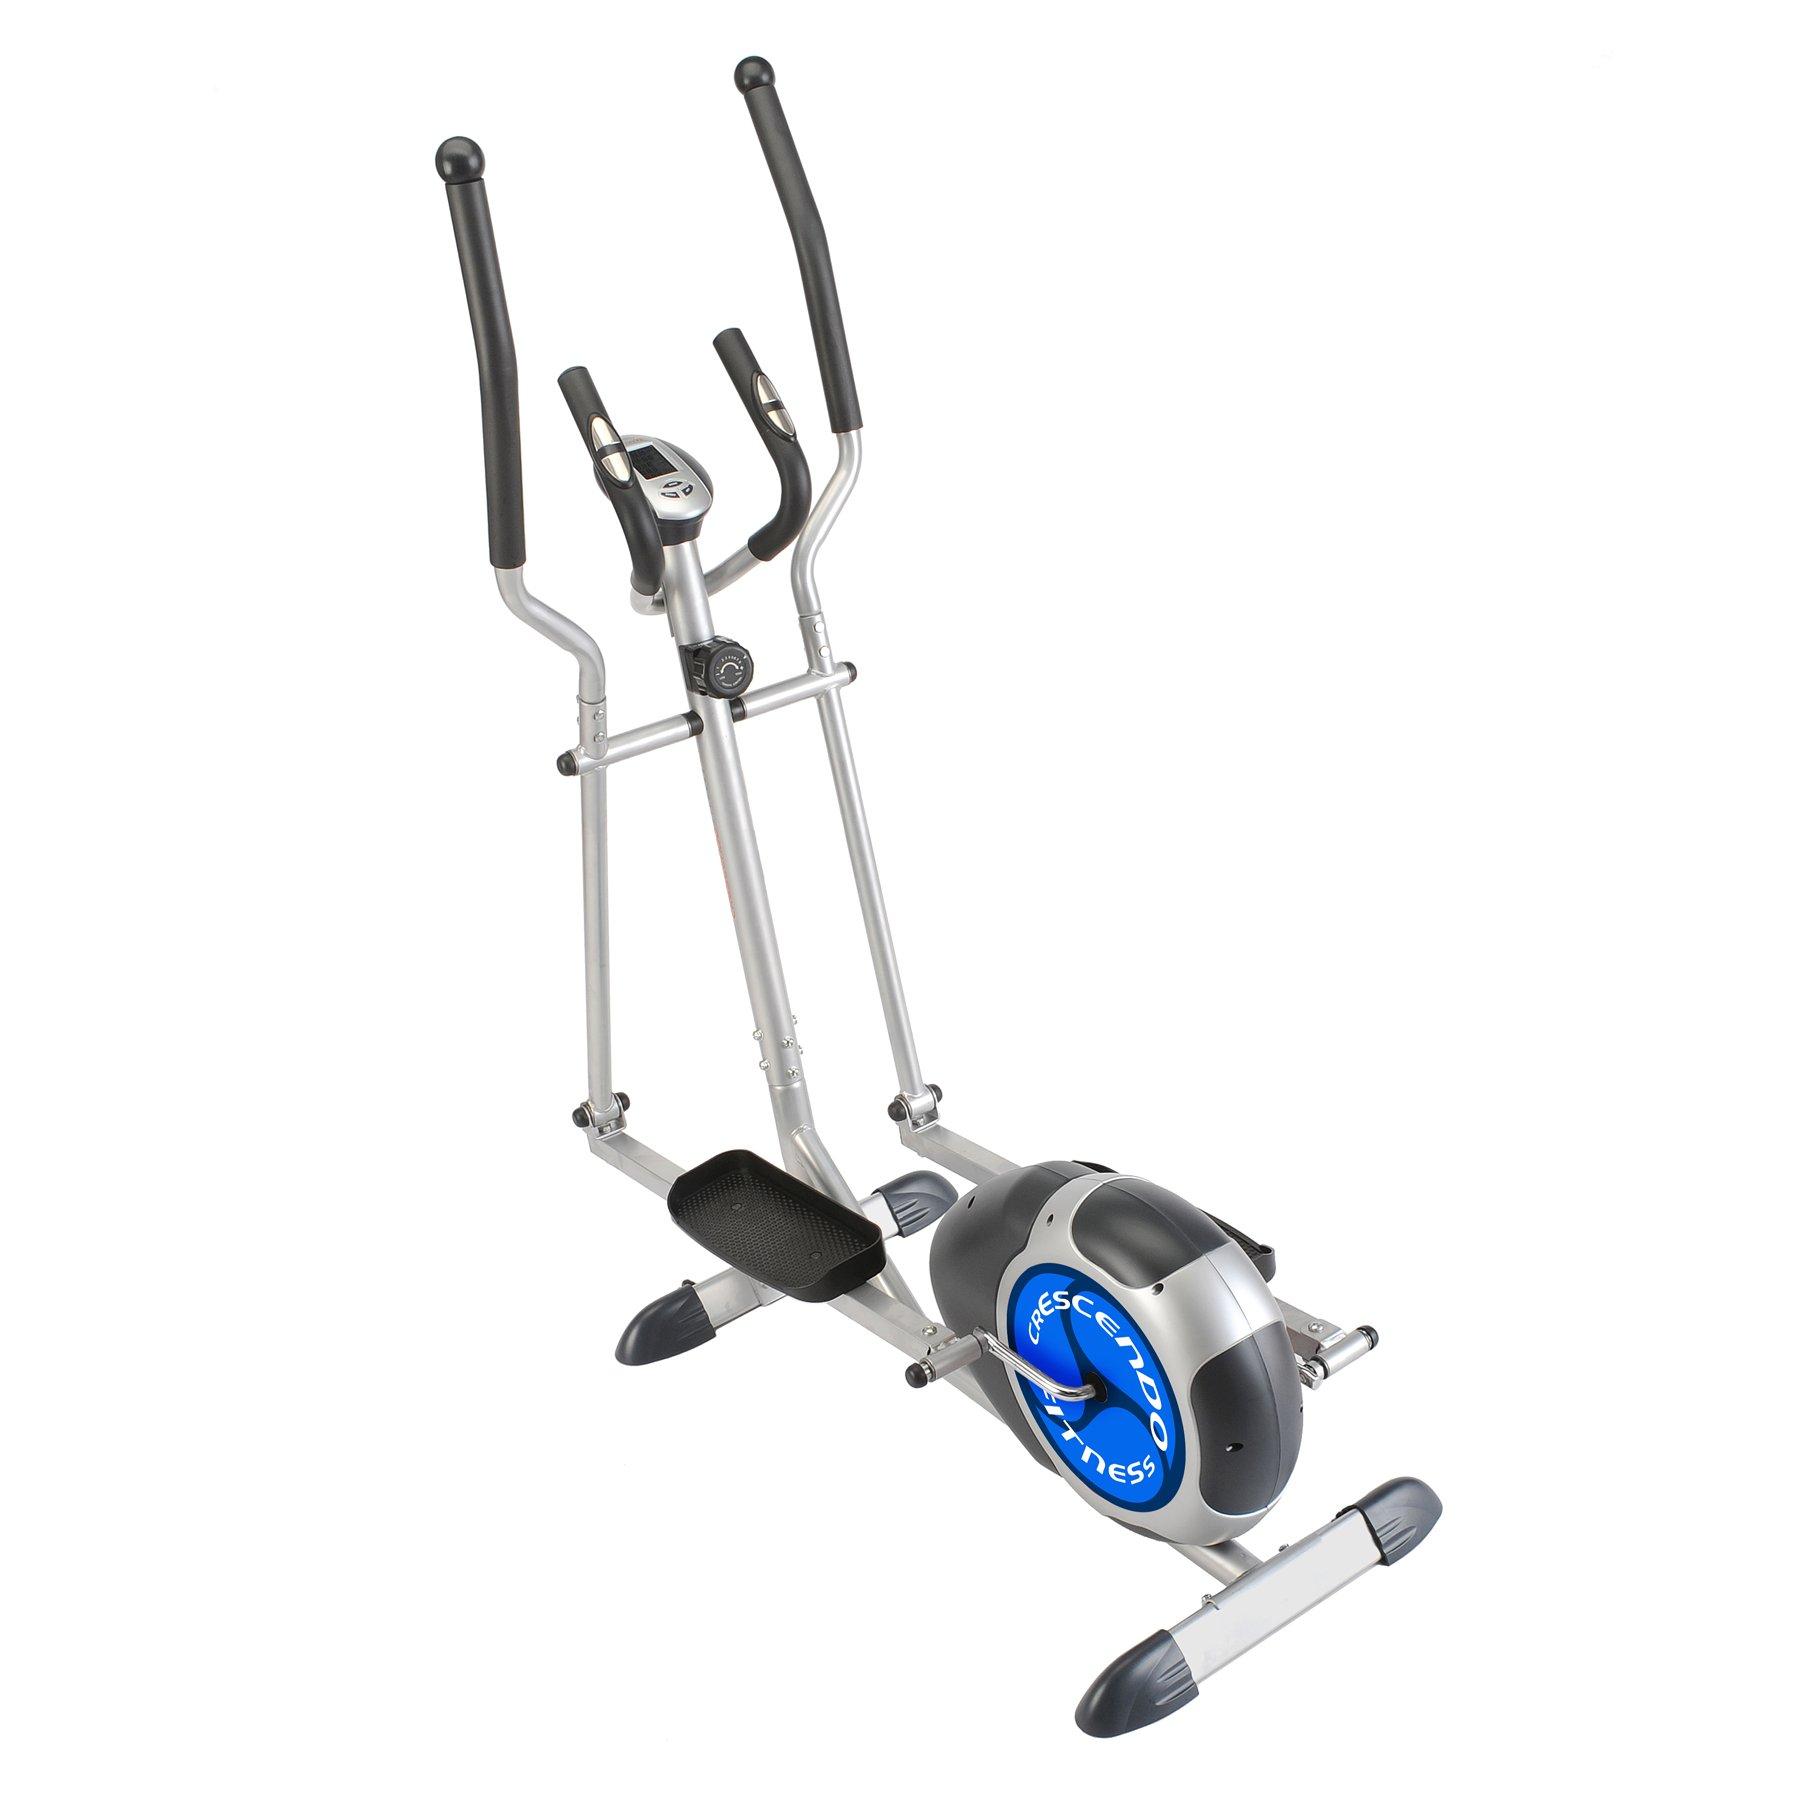 Crescendo Fitness Magnetic Resistance Elliptical Cross Trainer